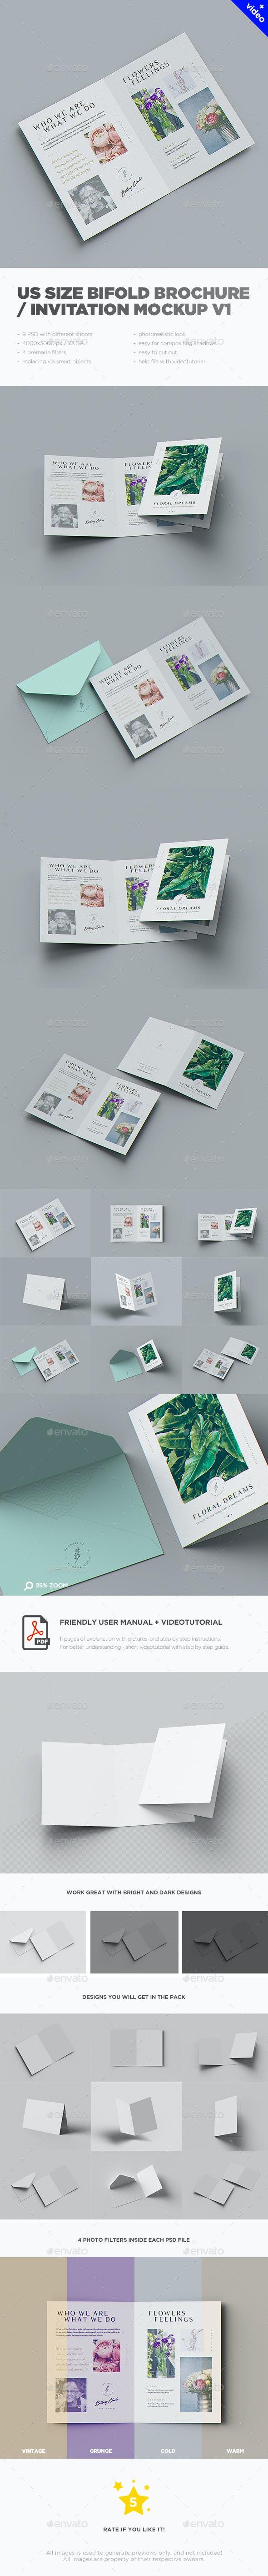 US Size Bifold Brochure / Invitation Mockup v1 - Brochures Print